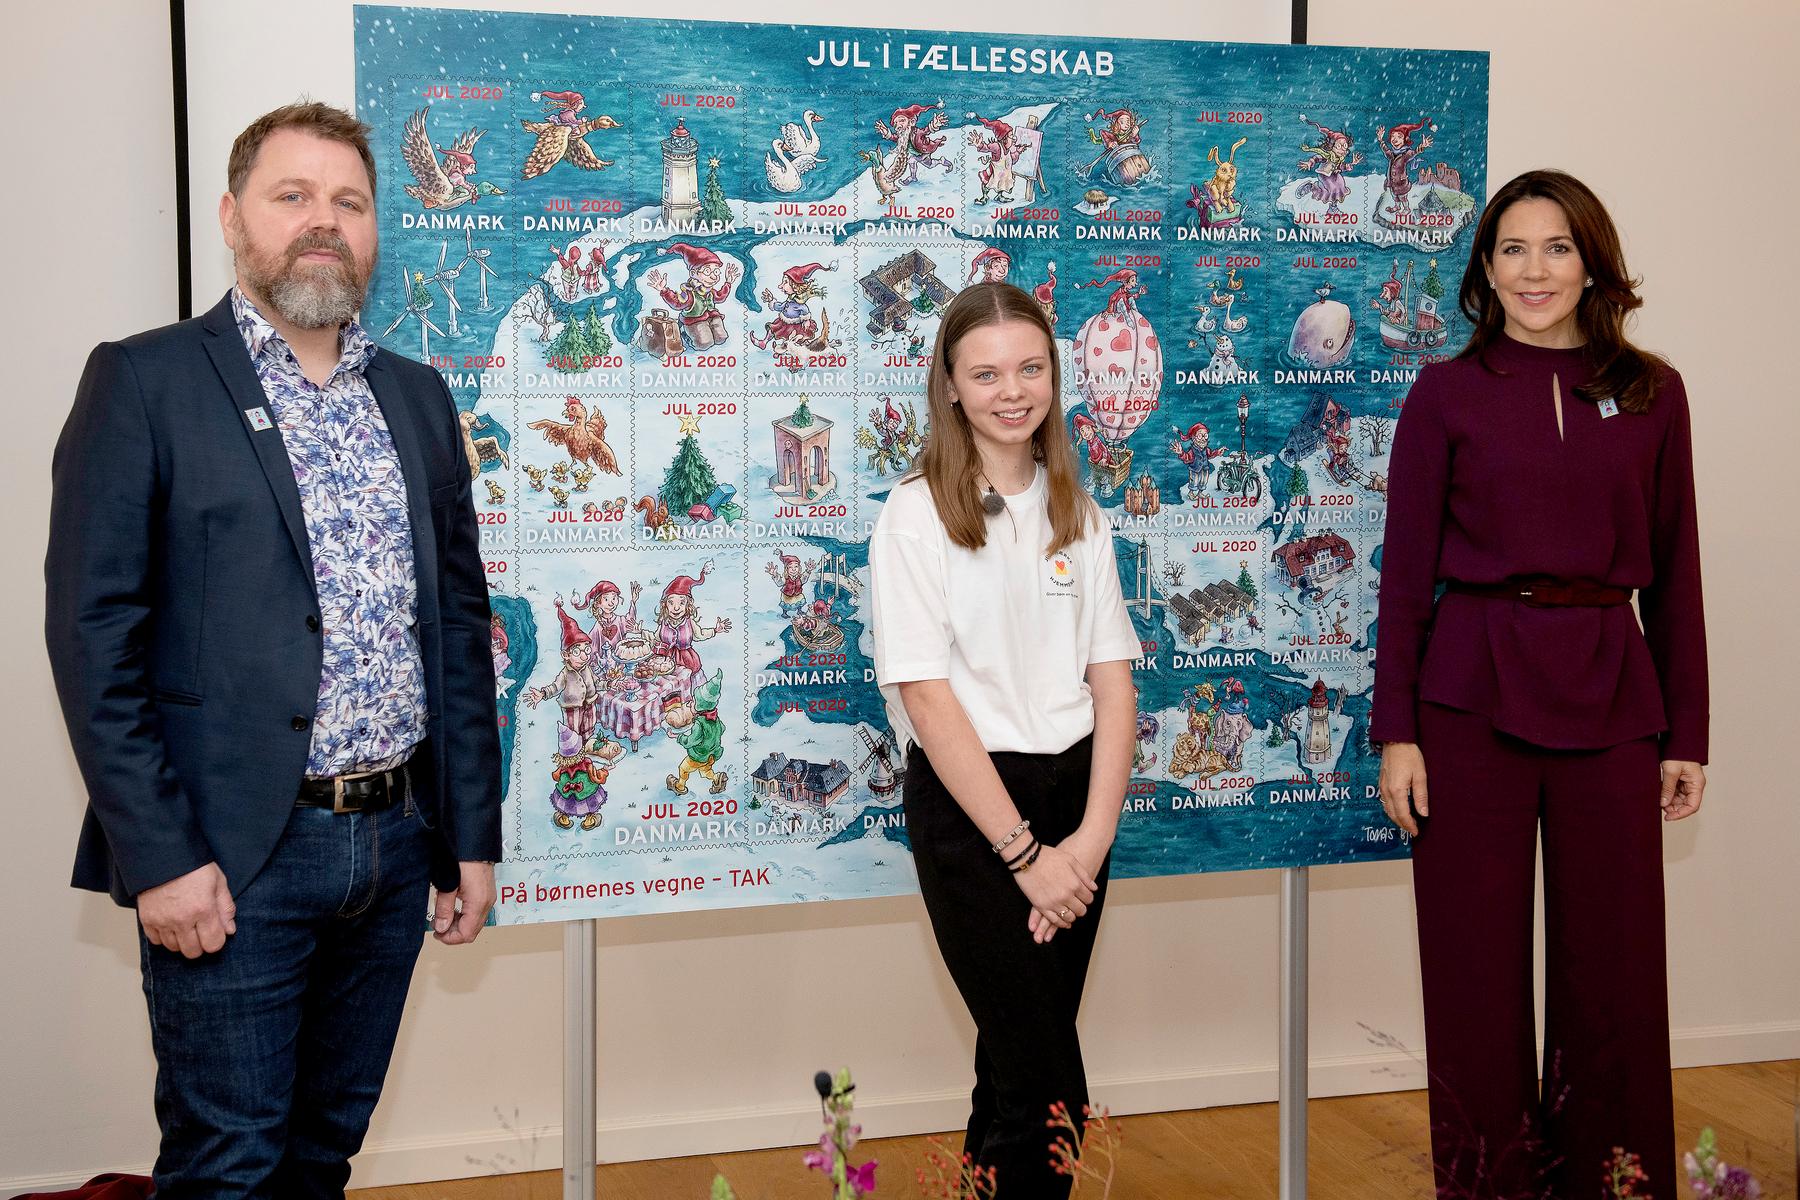 Julemærkekunstner 2020 Thomas Björnsson